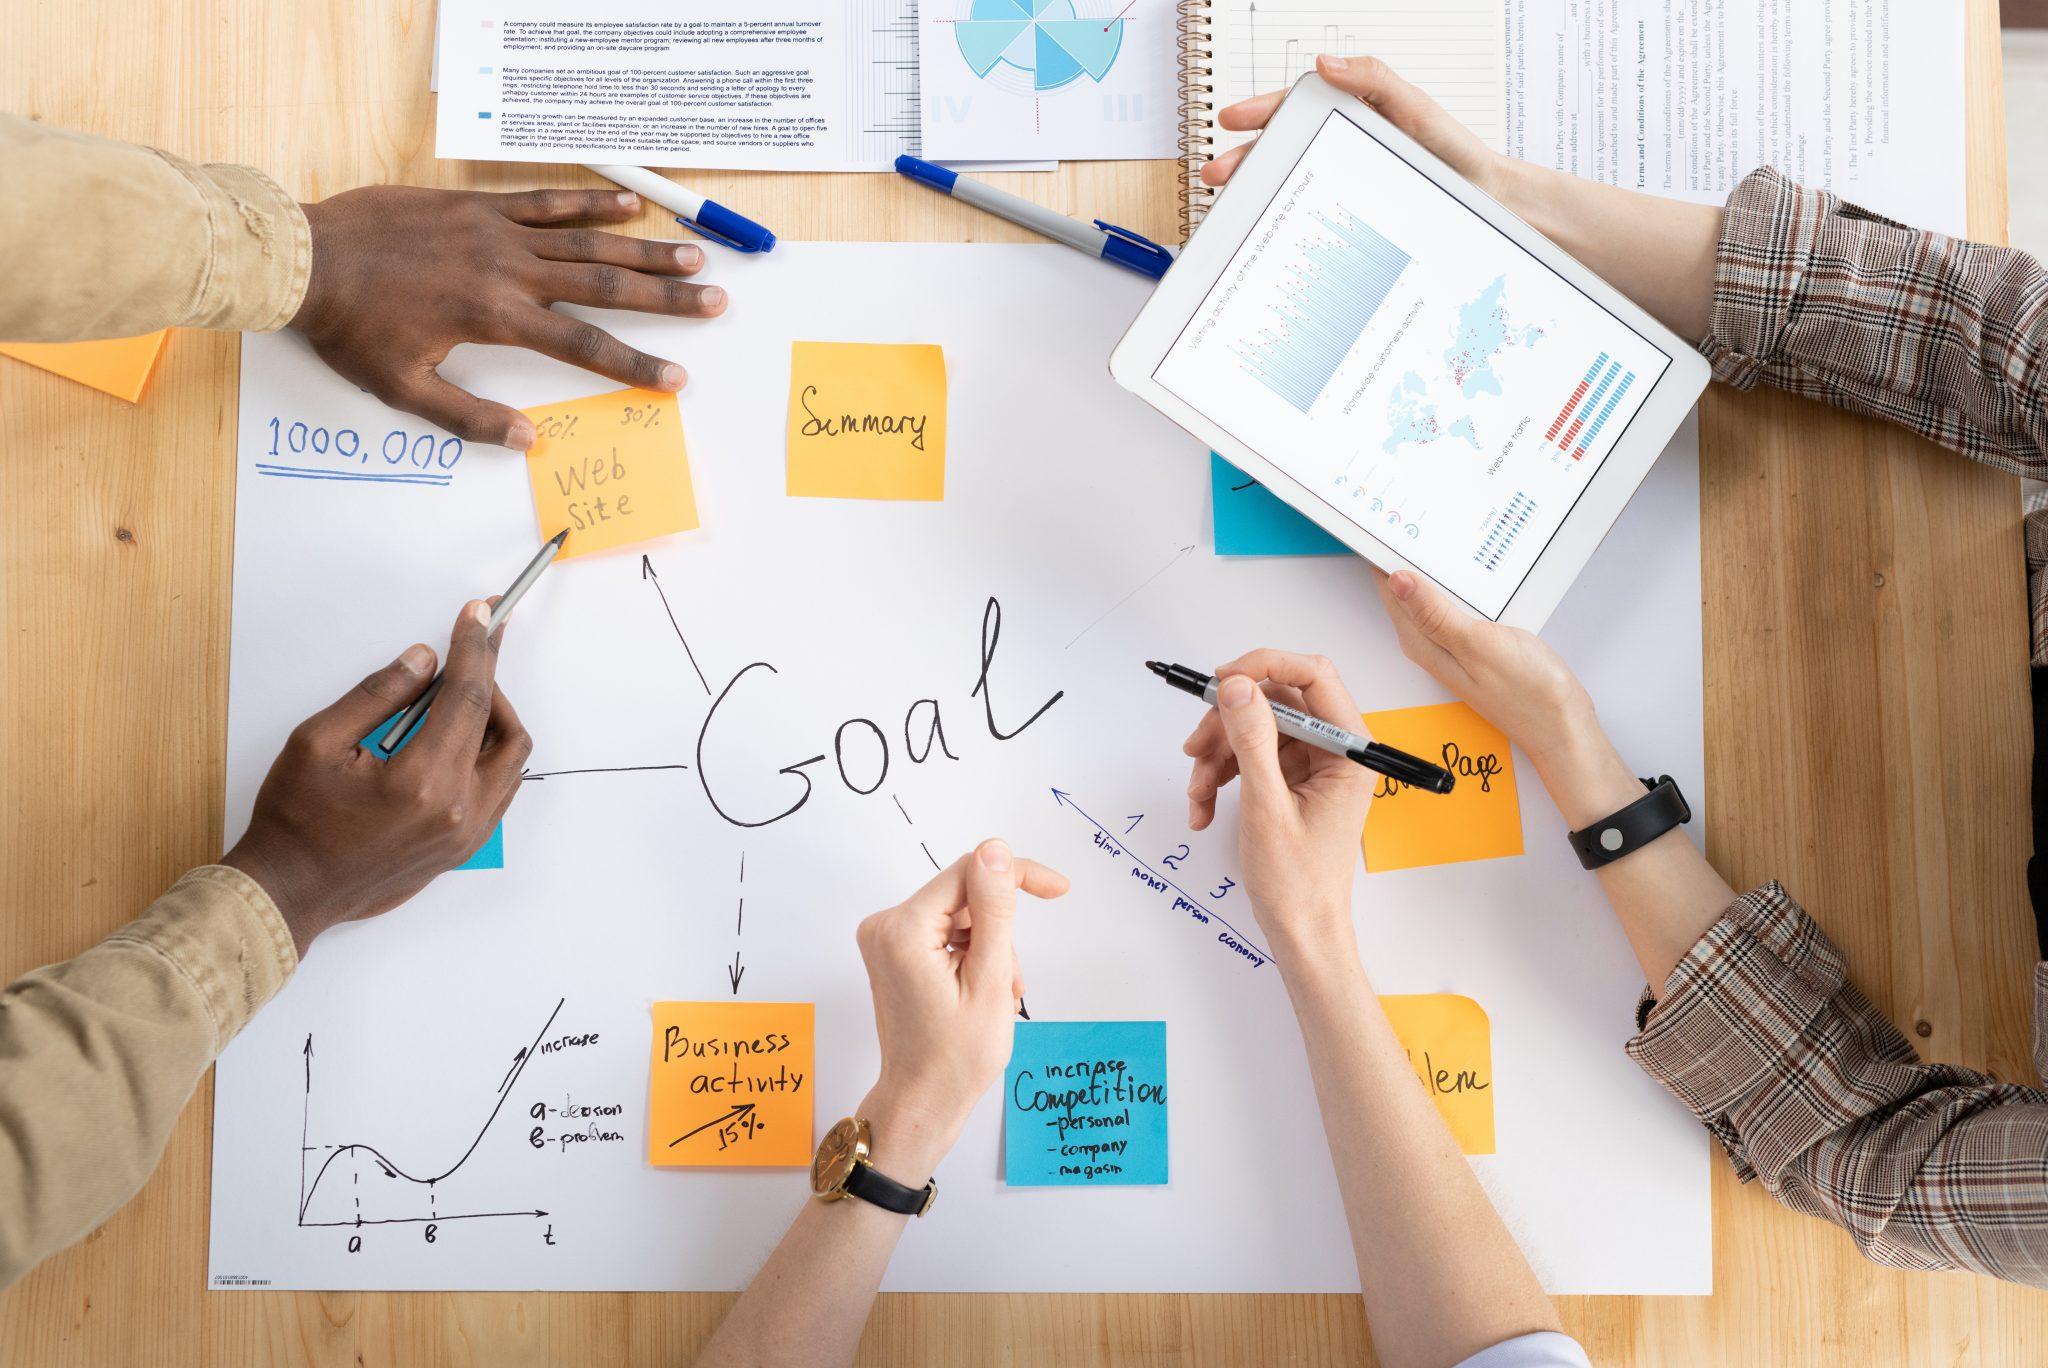 objetivos de una empresa marcar